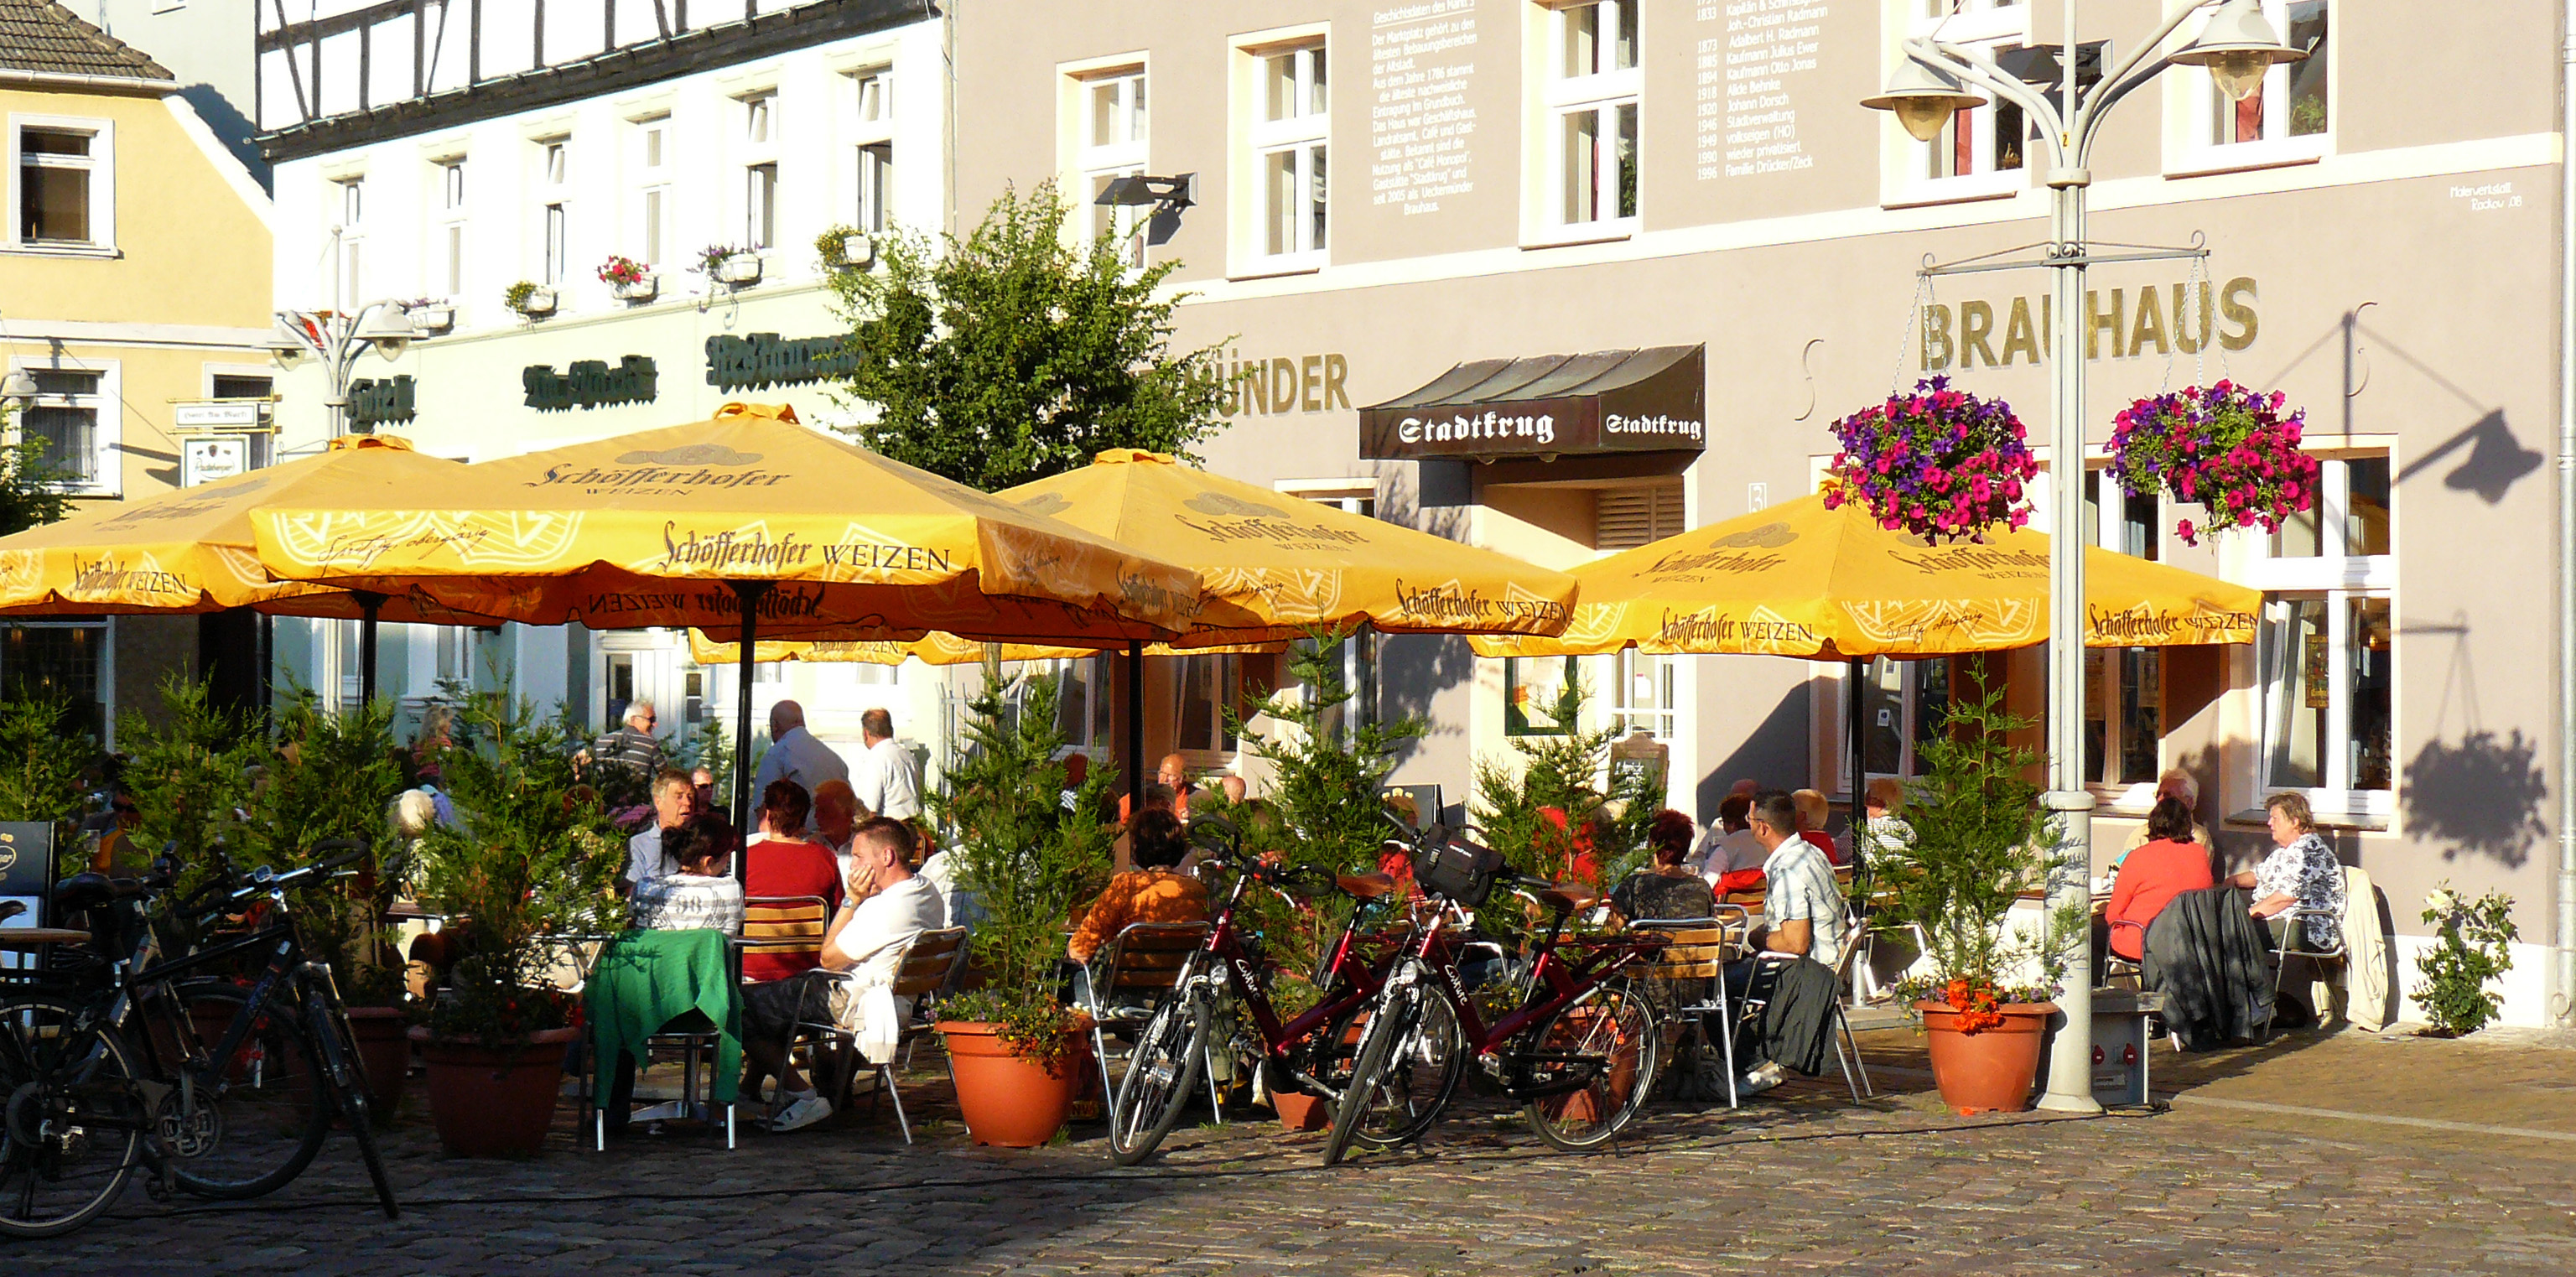 Marktplatz Ueckermünde